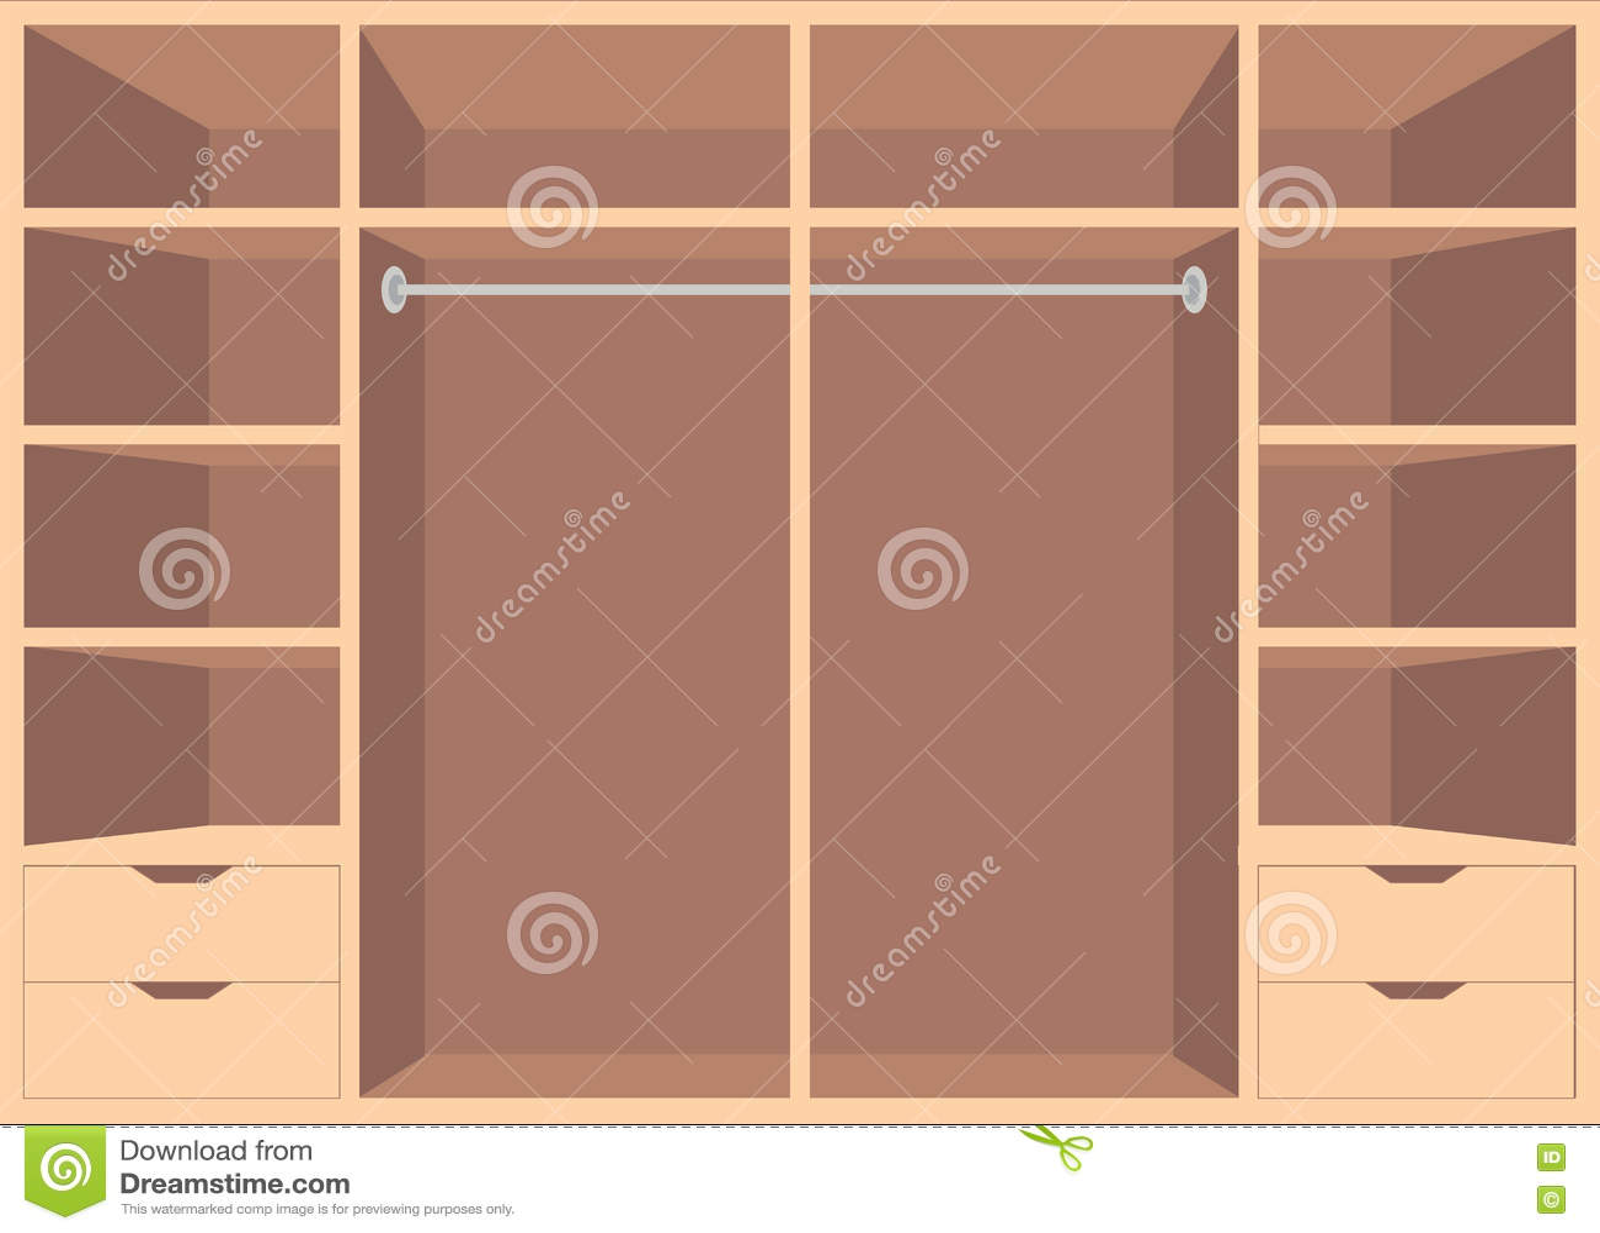 Interior wooden shelves free vector - Royalty Free Vector